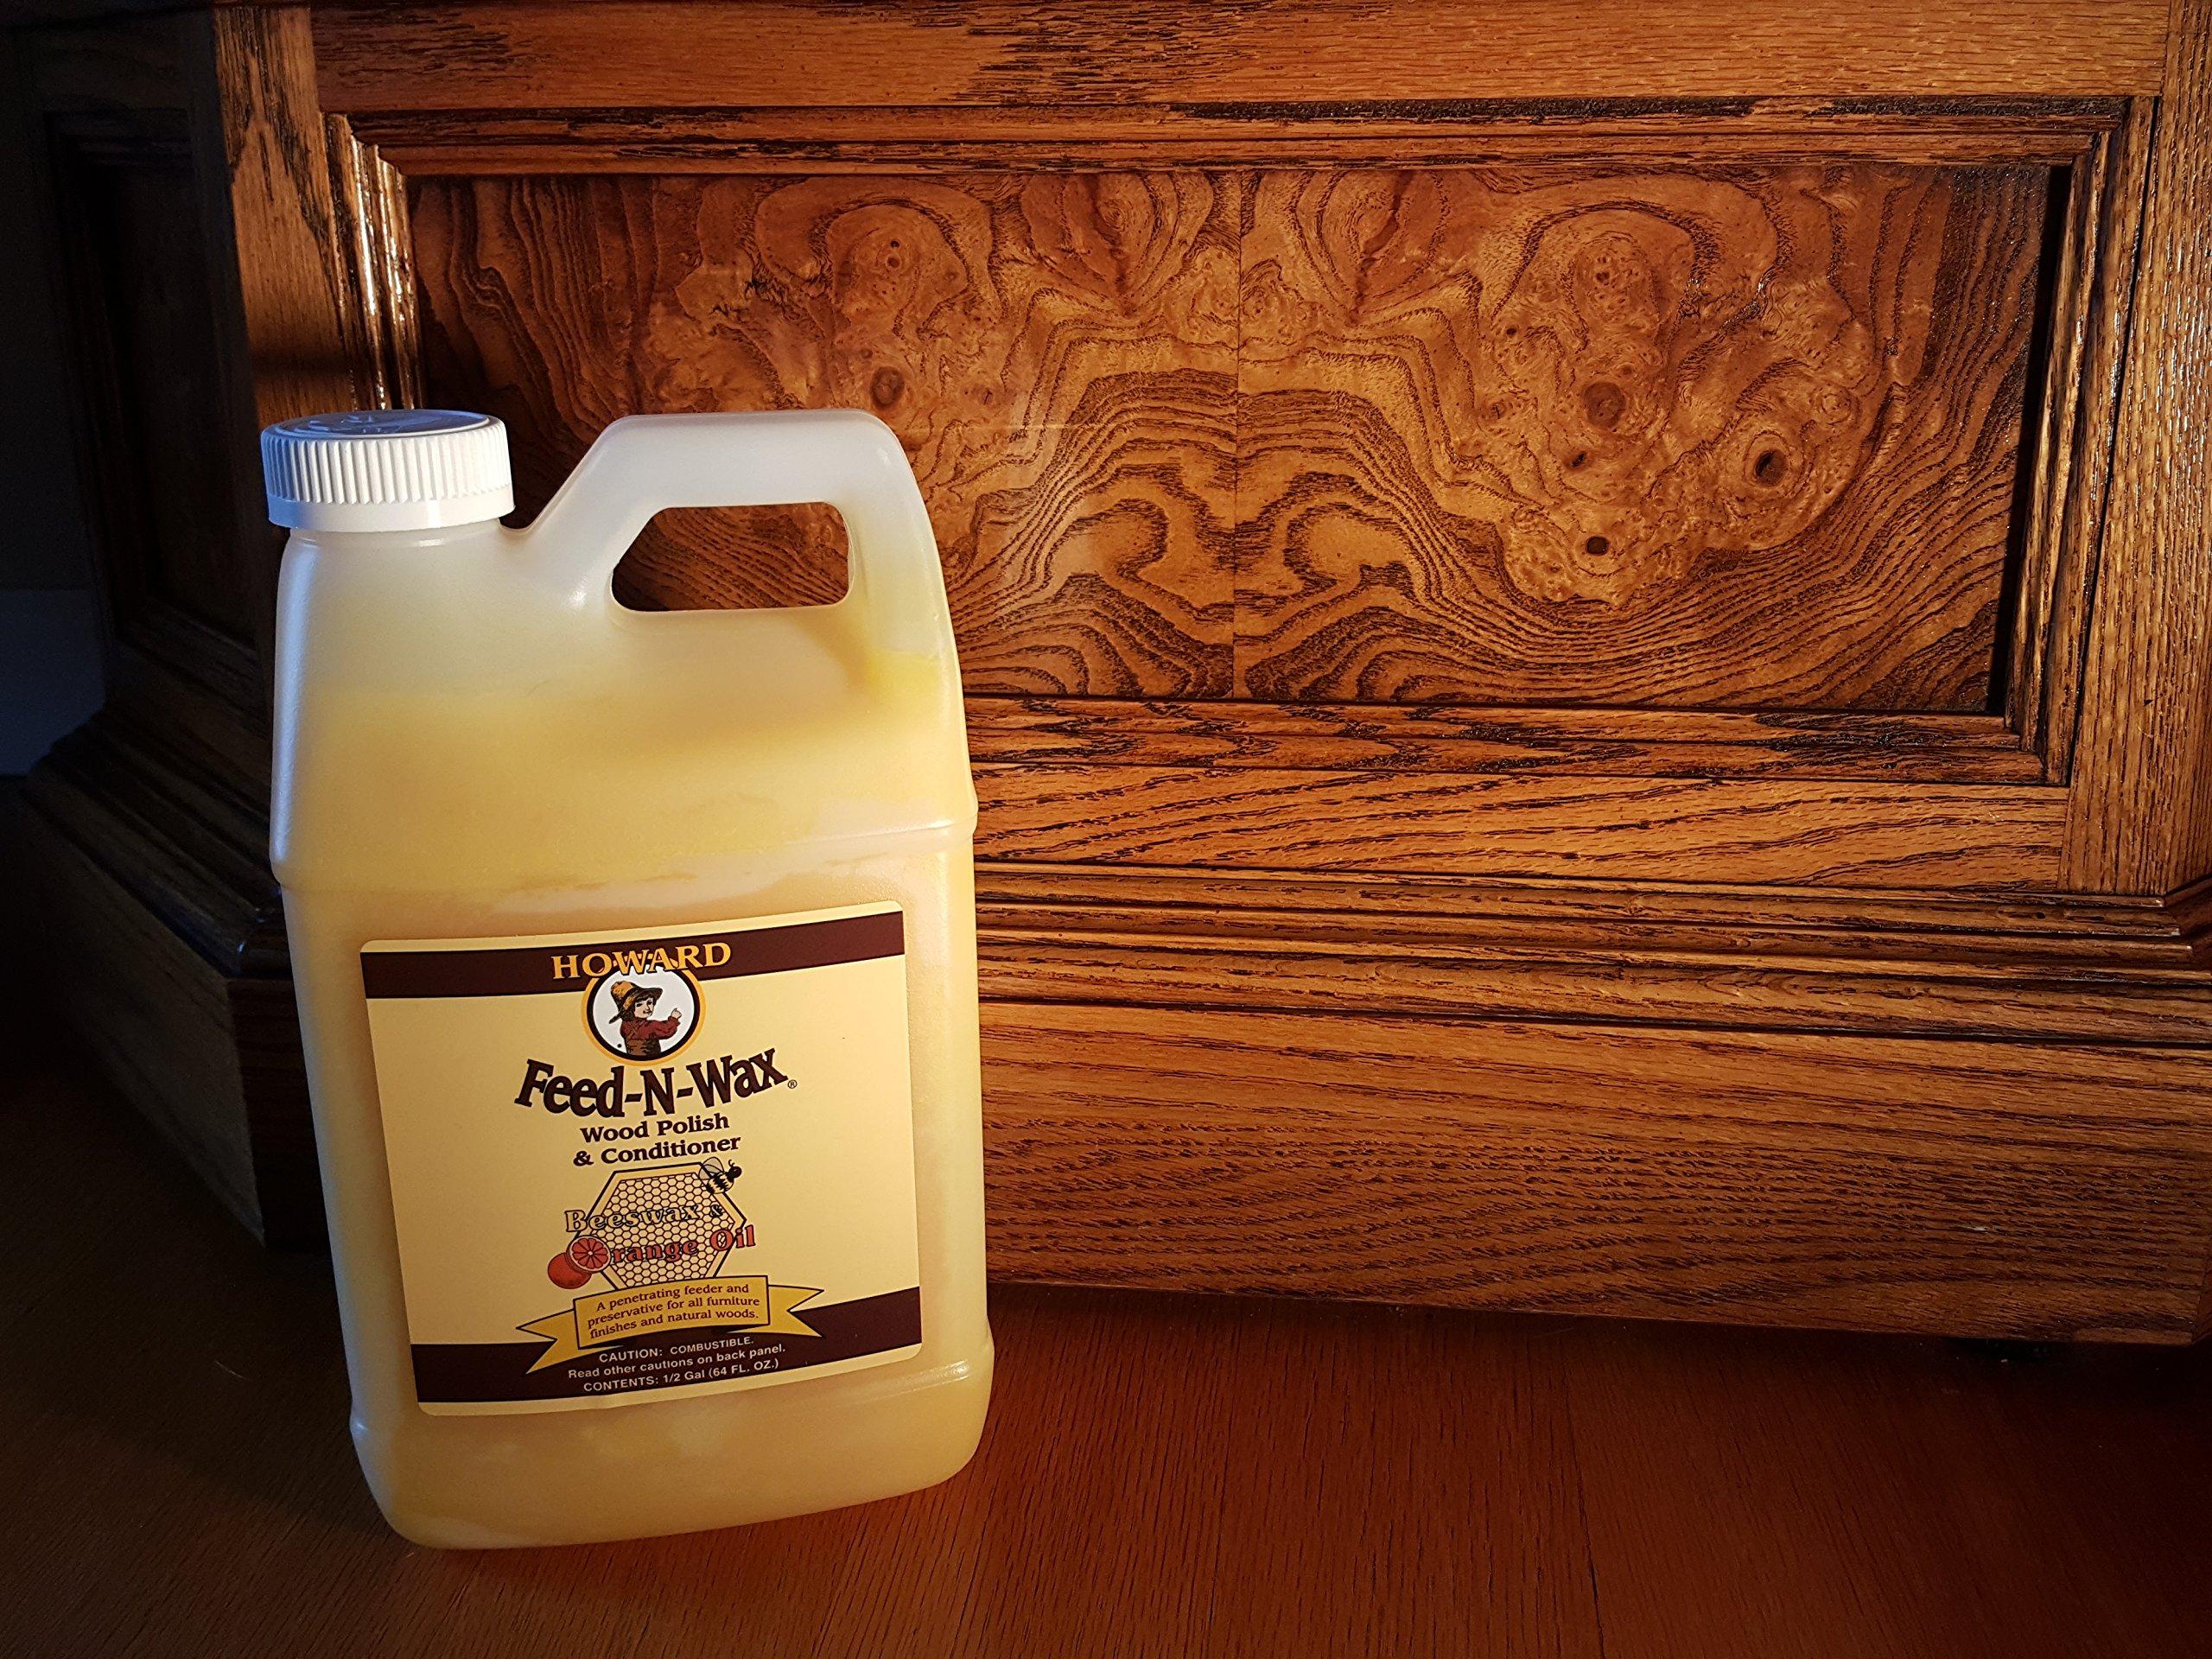 Howard Feed-N-Wax Restorative Wood Polish and Conditioner 64oz 1/2 Gallon, Polish Wood Floors, Antique Furniture Restoration, Wood Furniture by Howard Products (Image #6)